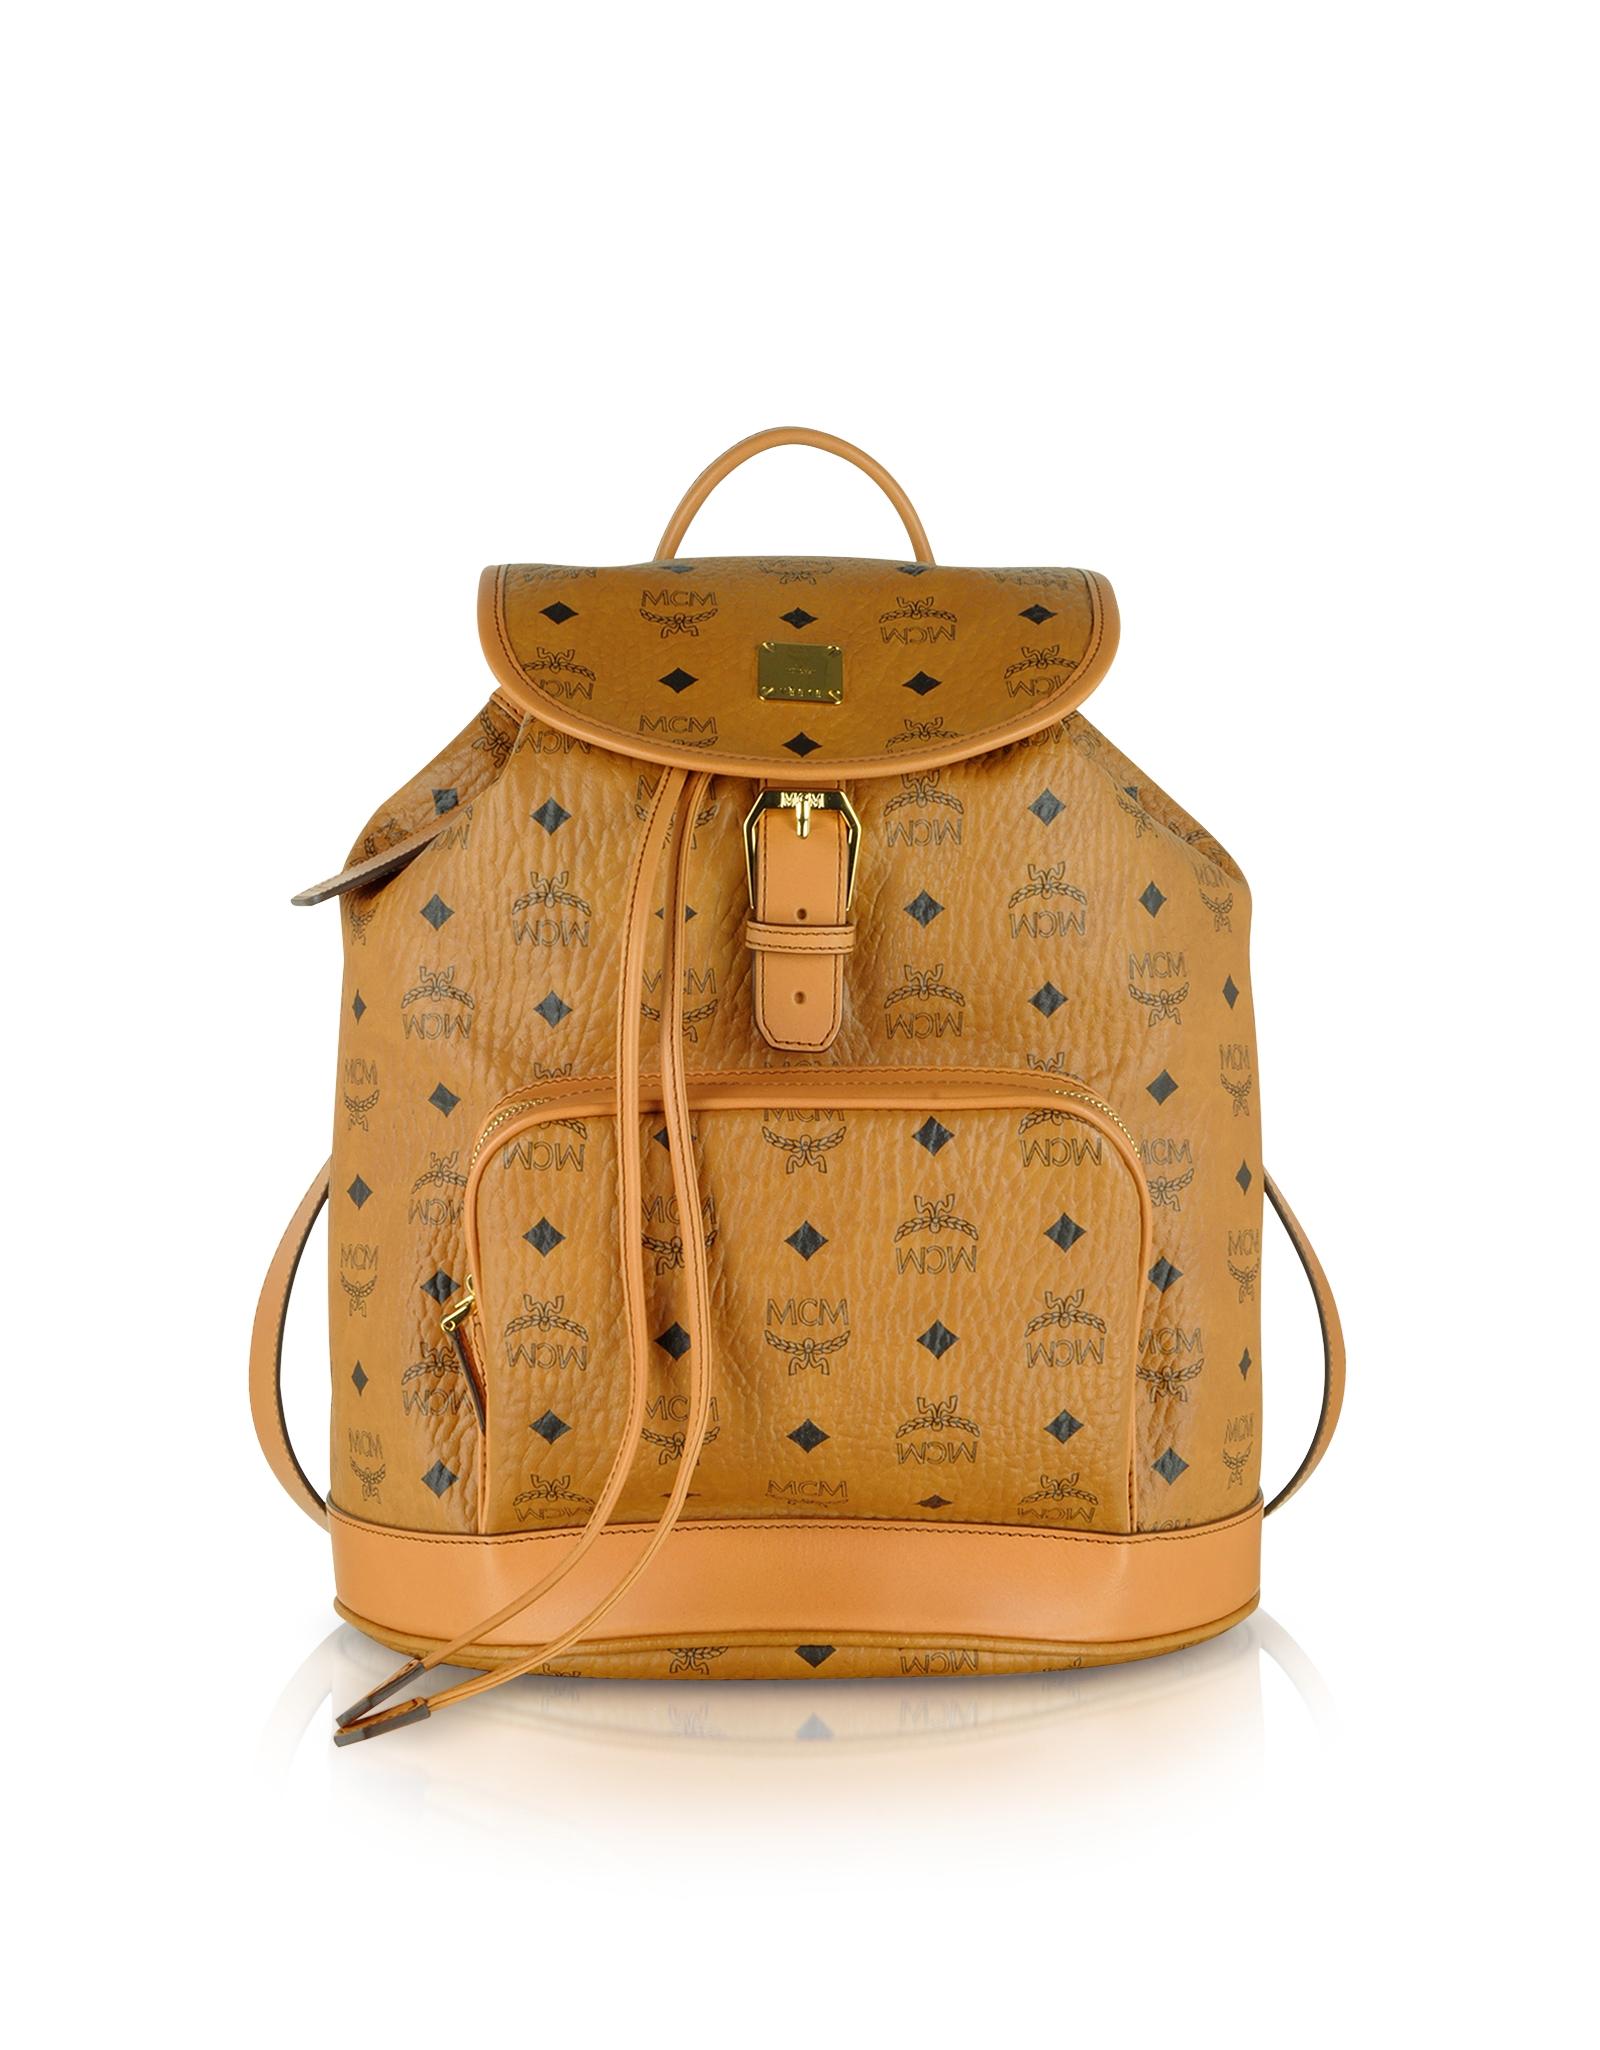 lyst mcm heritage cognac medium backpack in brown. Black Bedroom Furniture Sets. Home Design Ideas